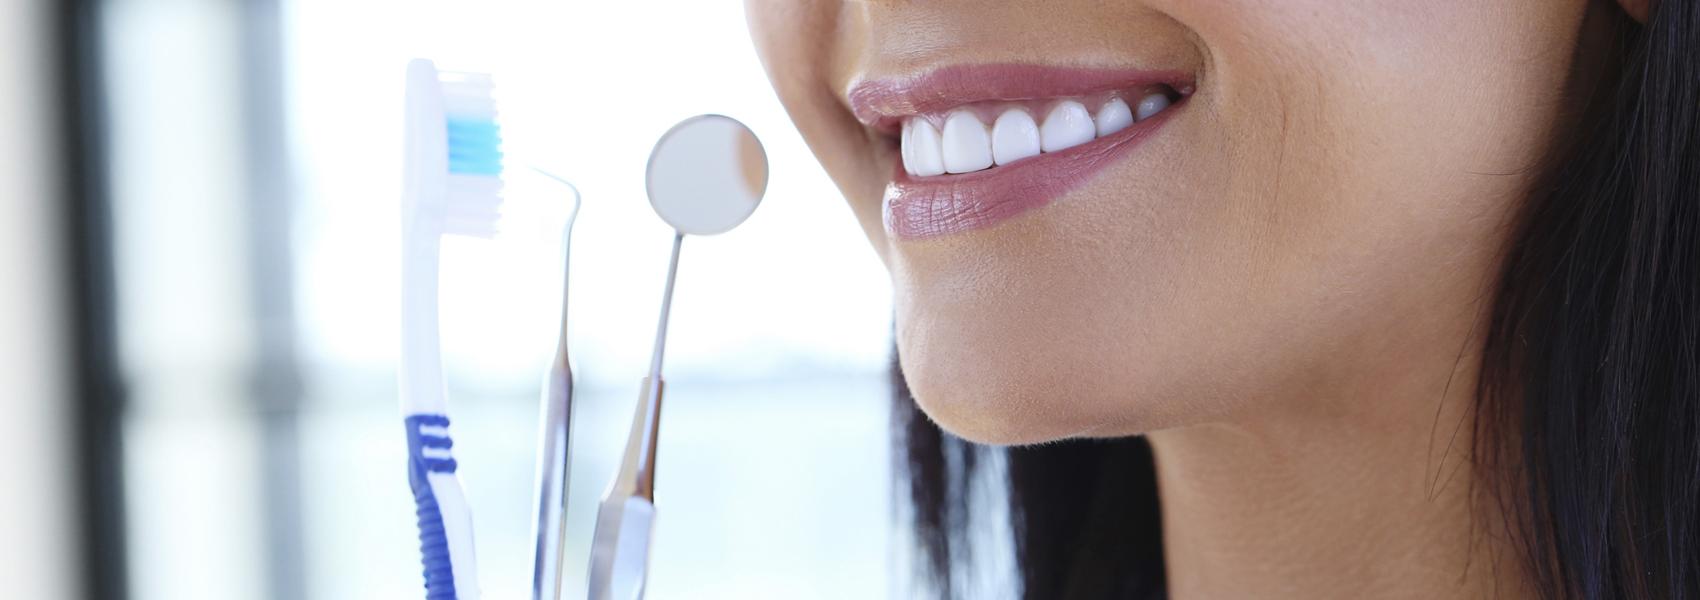 Dentistas en Guadalajara